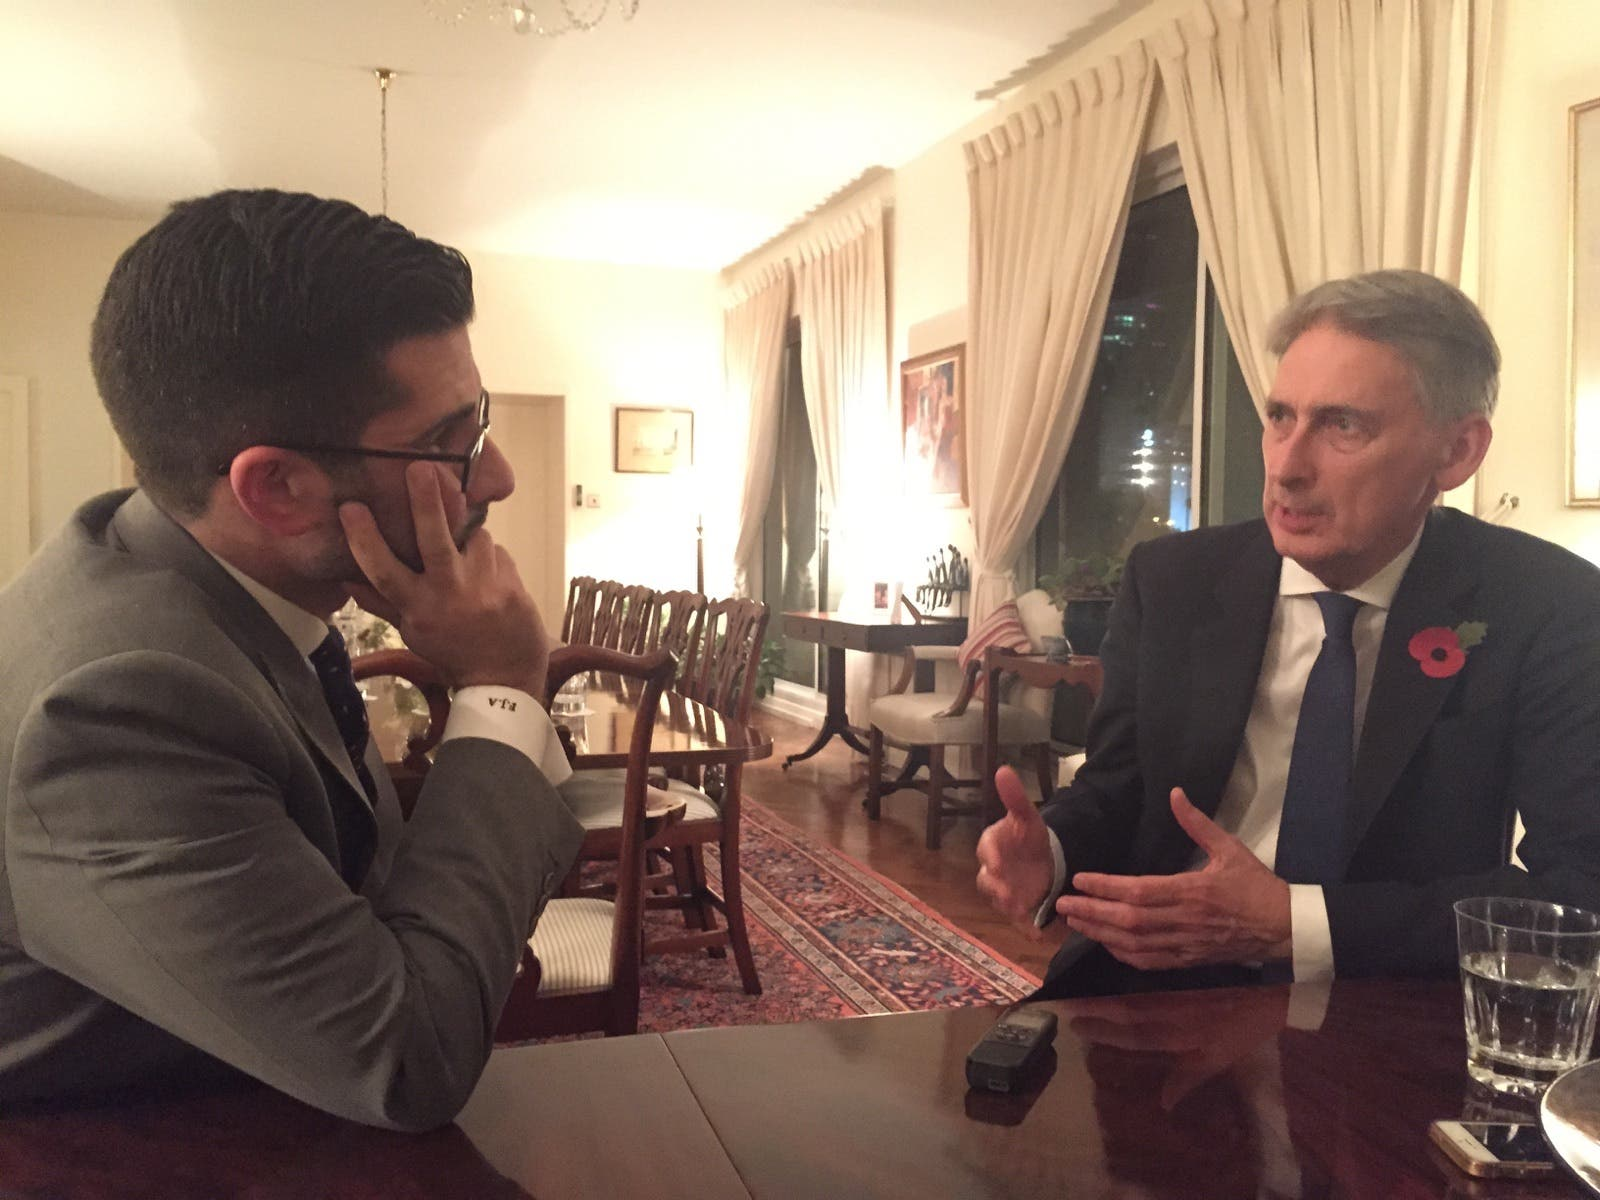 Al Arabiya News Editor-in-Chief Faisal J. Abbas interviews British Foreign Secretary Philip Hammond. (Ismaeel Naar/ Al Arabiya News)